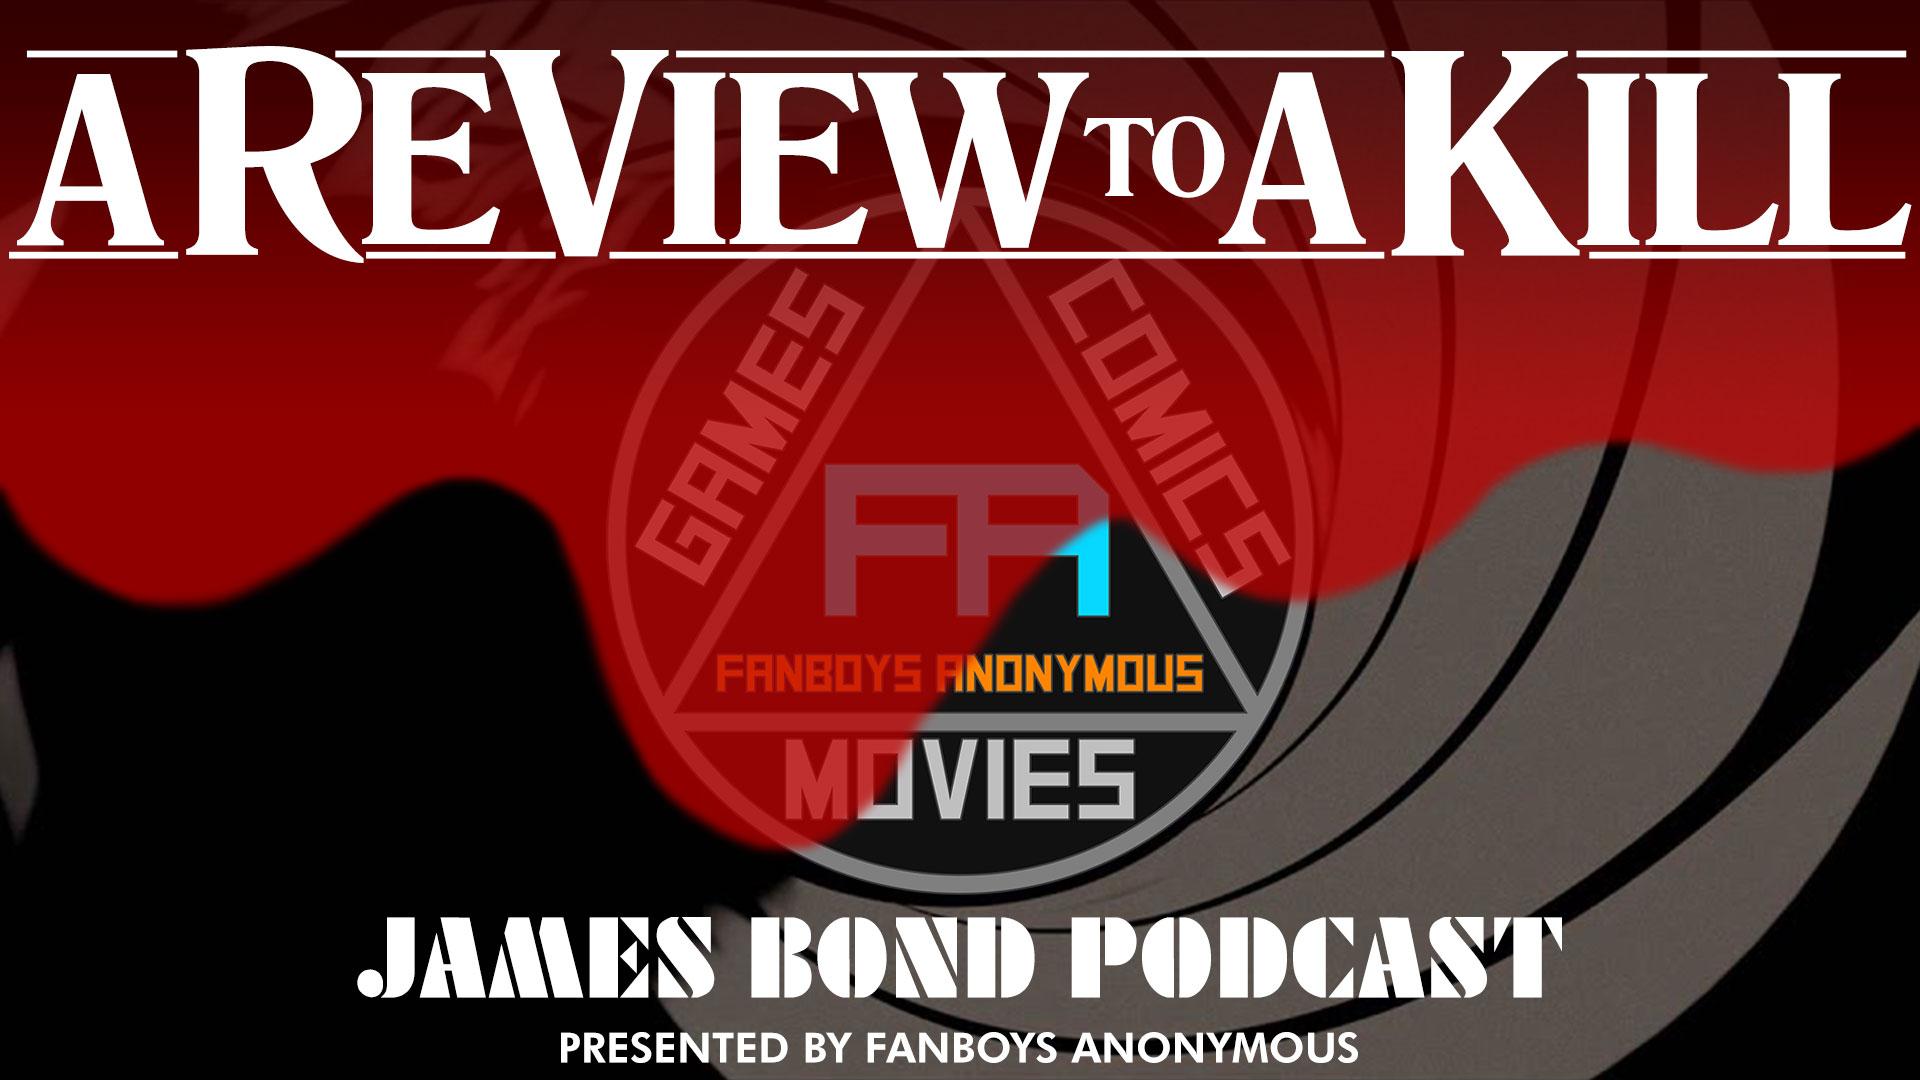 James Bond A Review to a Kill 007 podcast